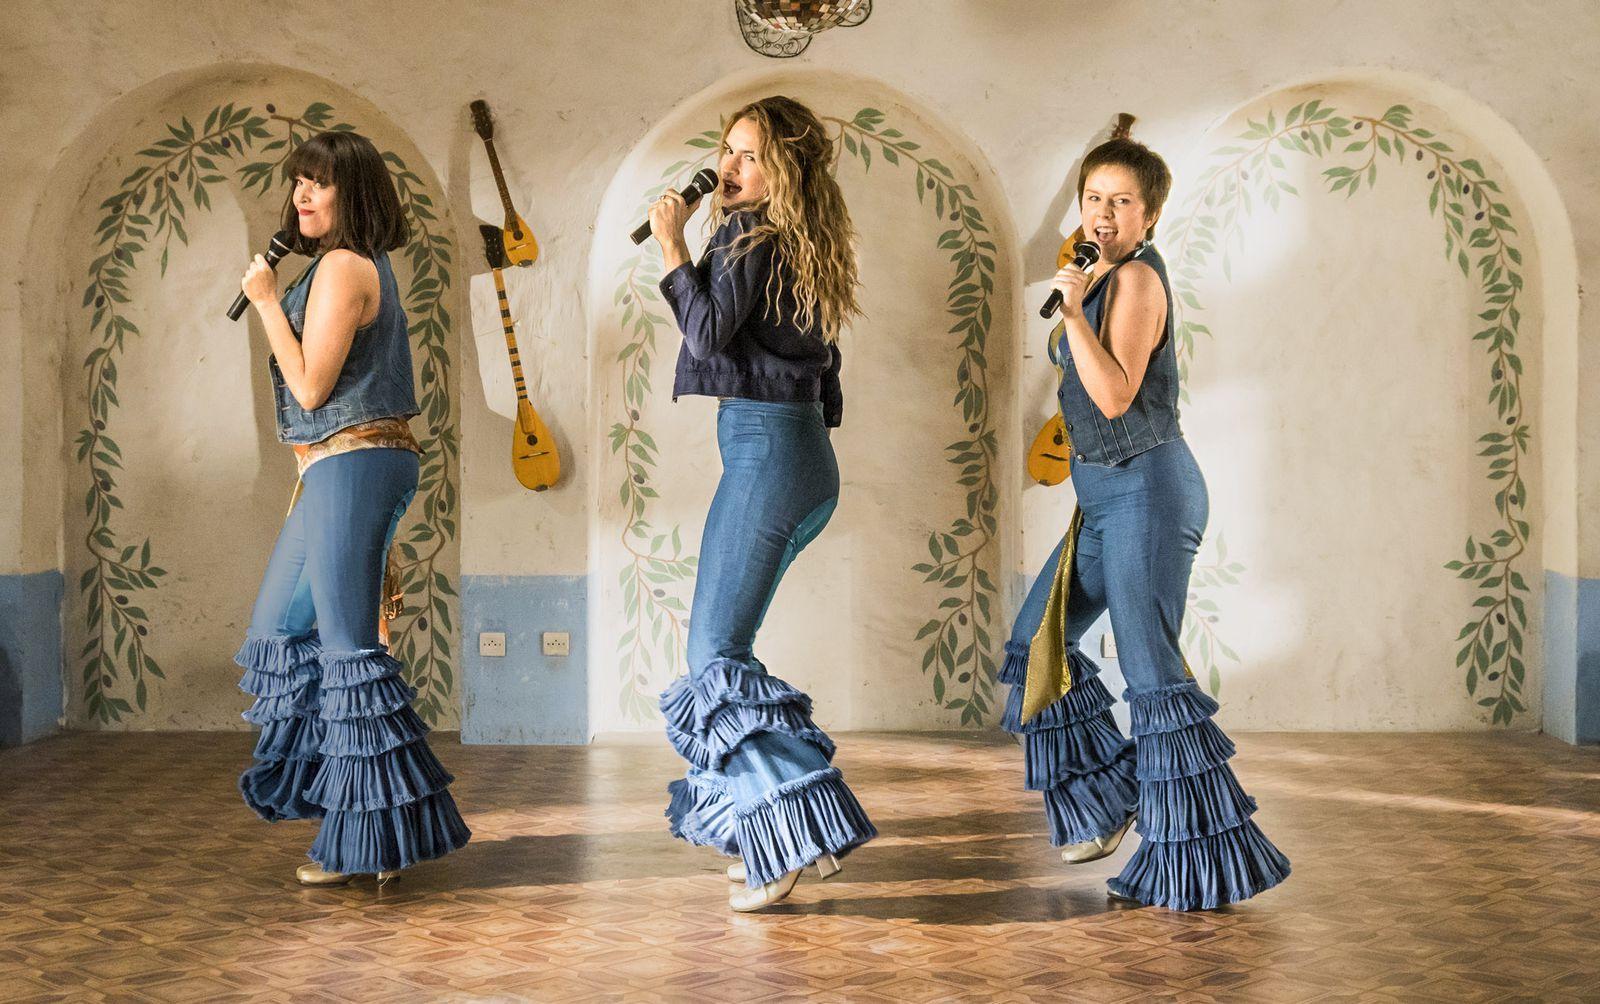 Mamma Mia Stars Cher Amanda Seyfried Lily James Talk Fashion Feminism The Power Of Song Top Halloween Costumes Mamma Mia Mama Mia